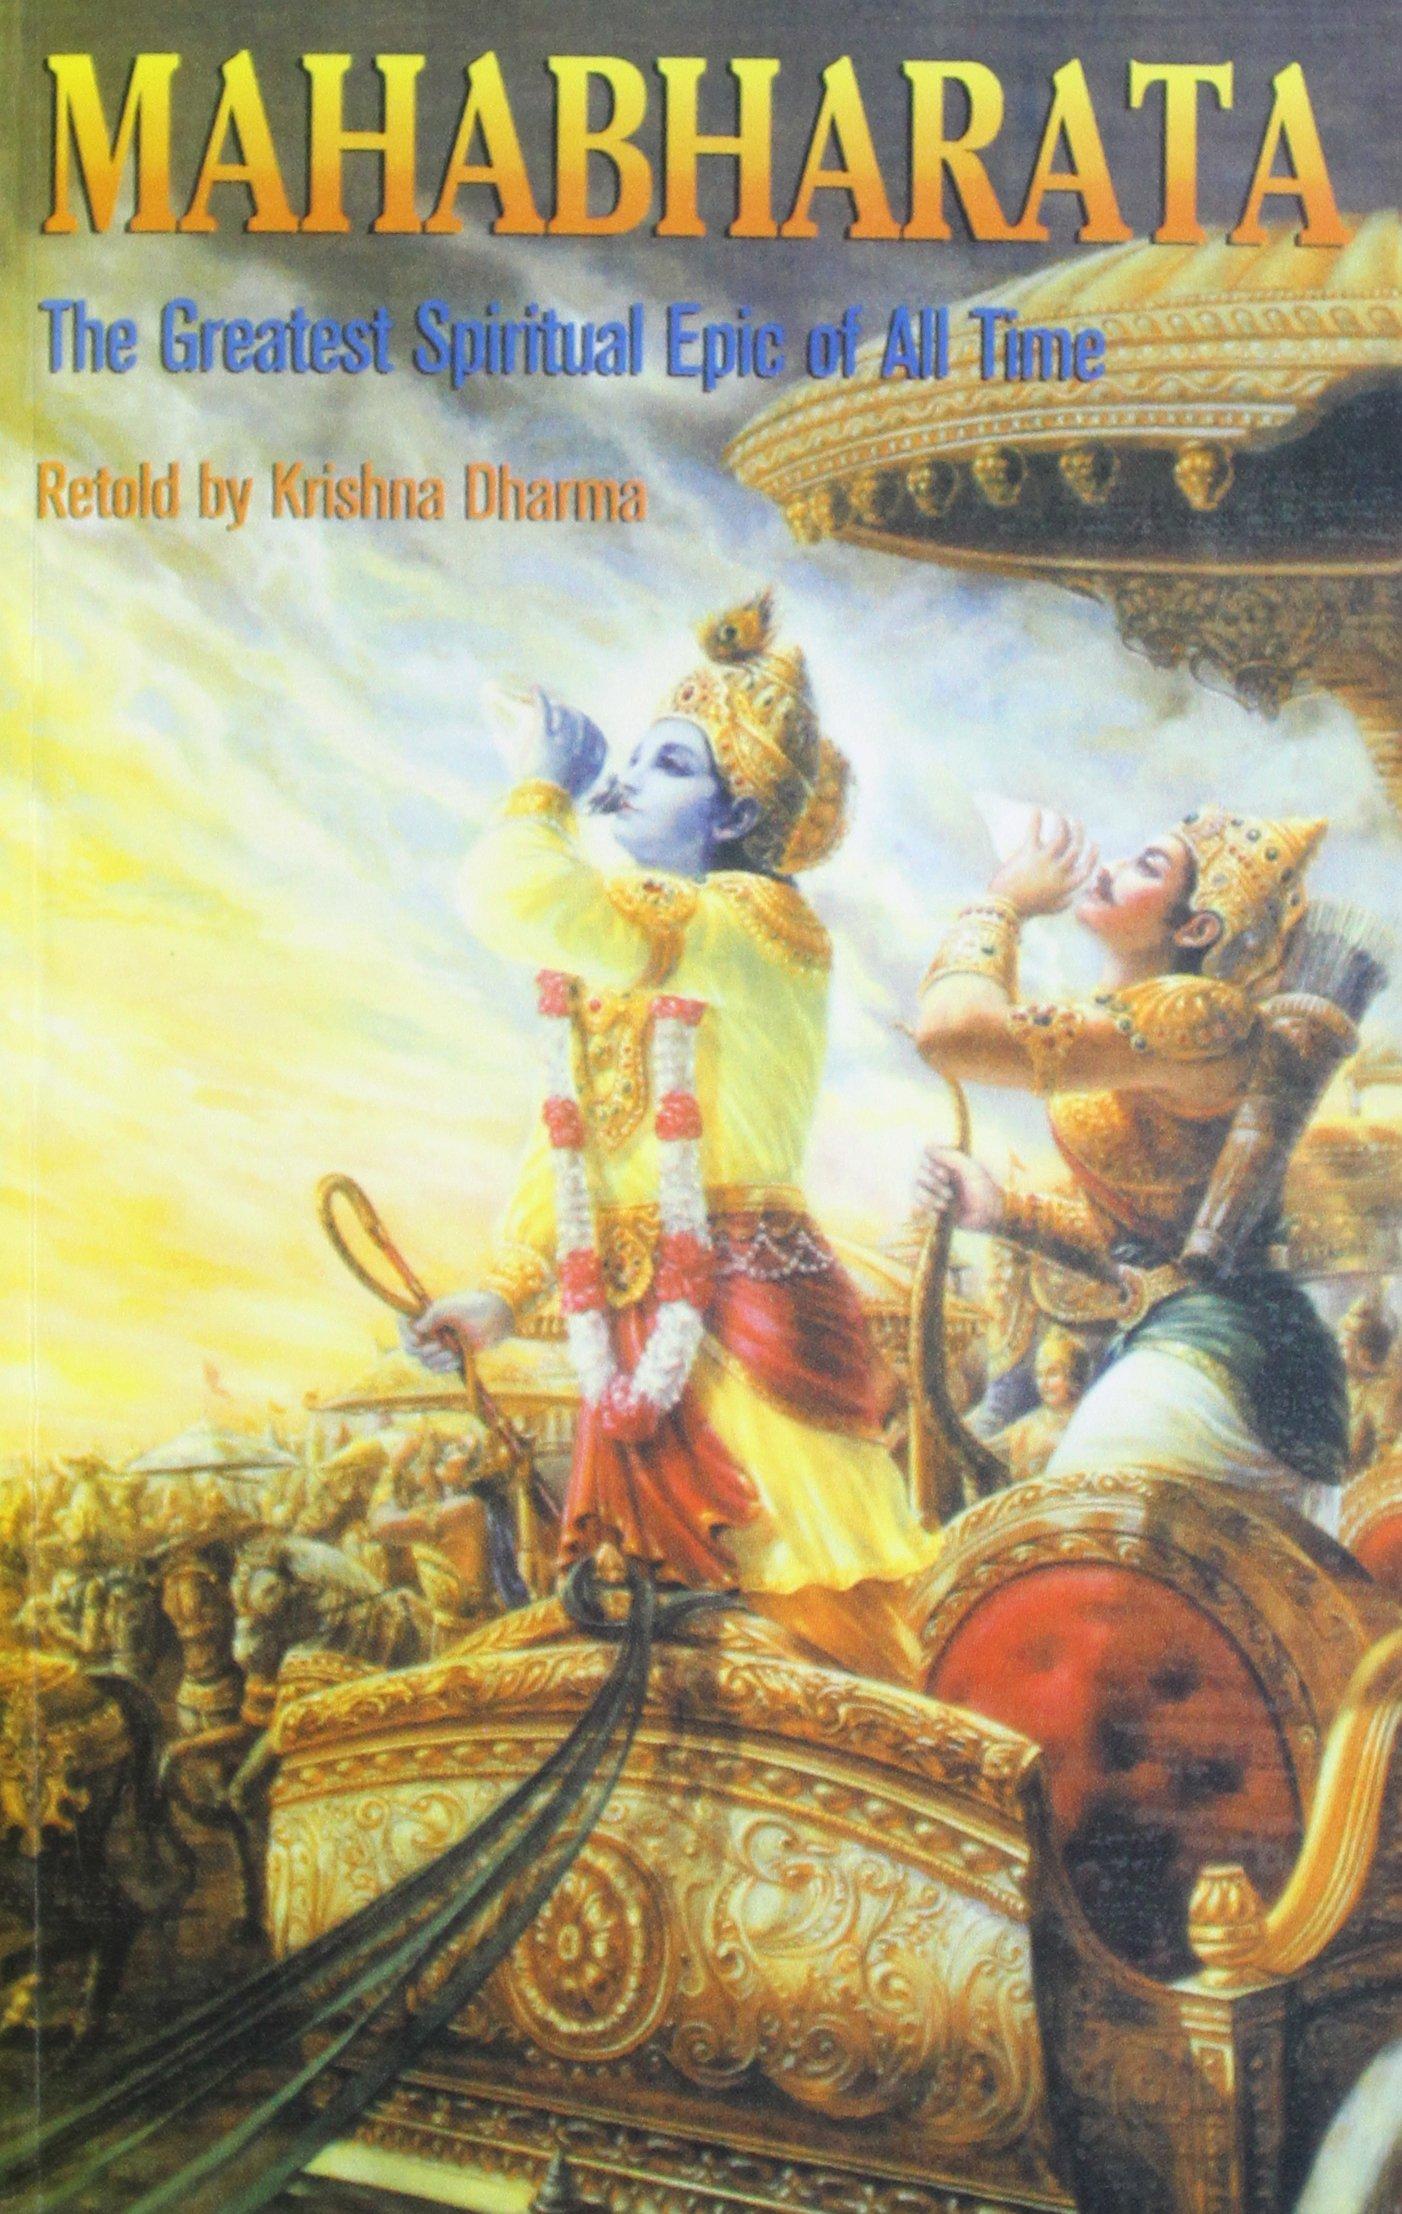 Mahabharata krishna dharma online dating